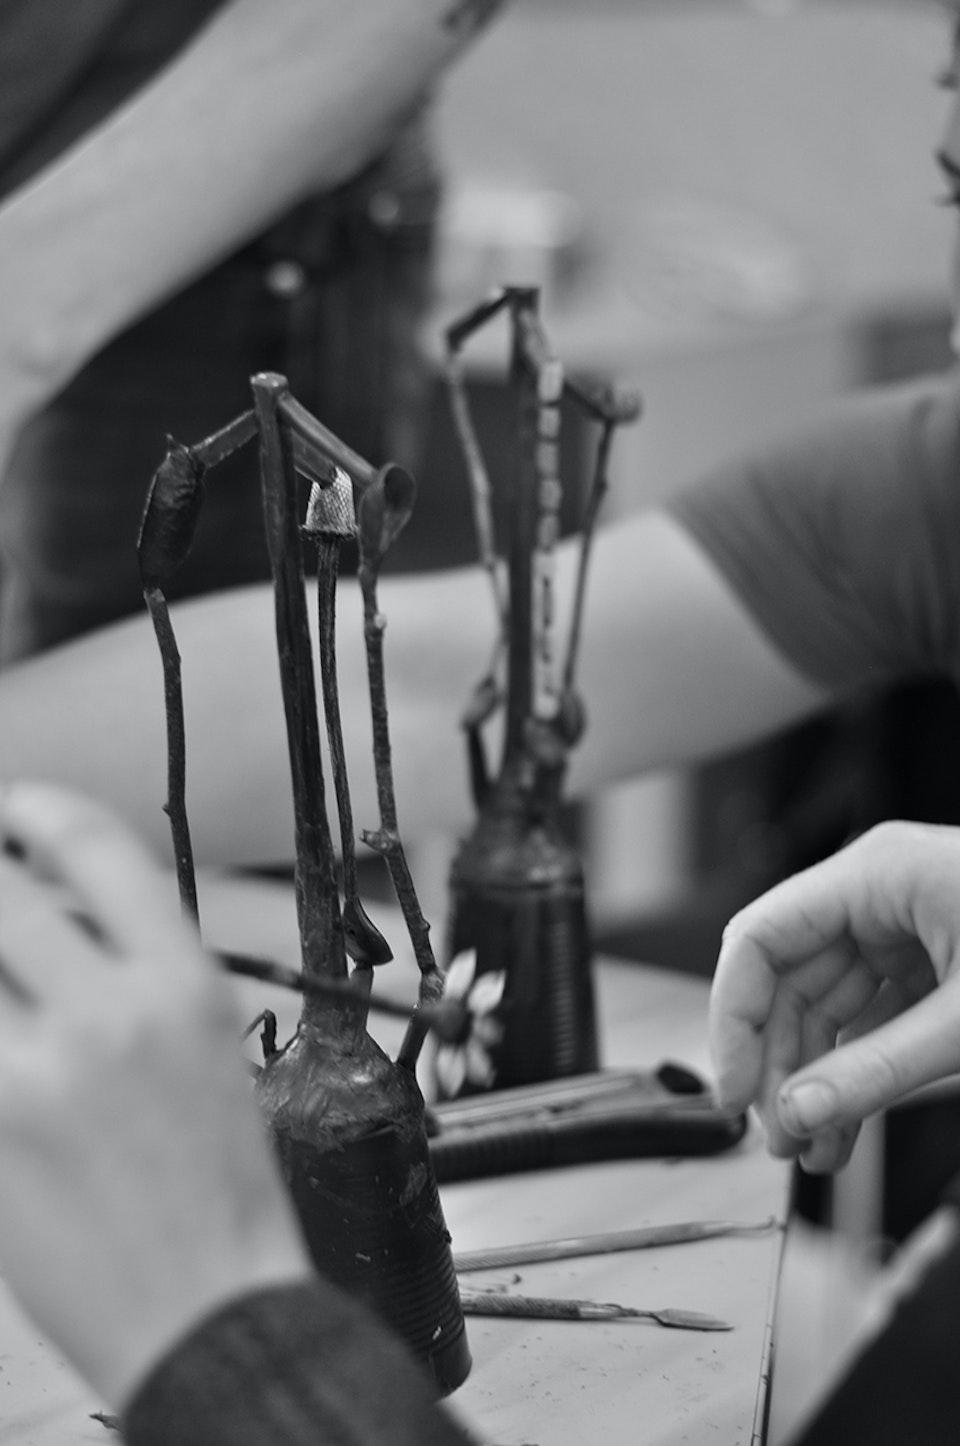 Alchemical Bronze Casting - Organics and wax